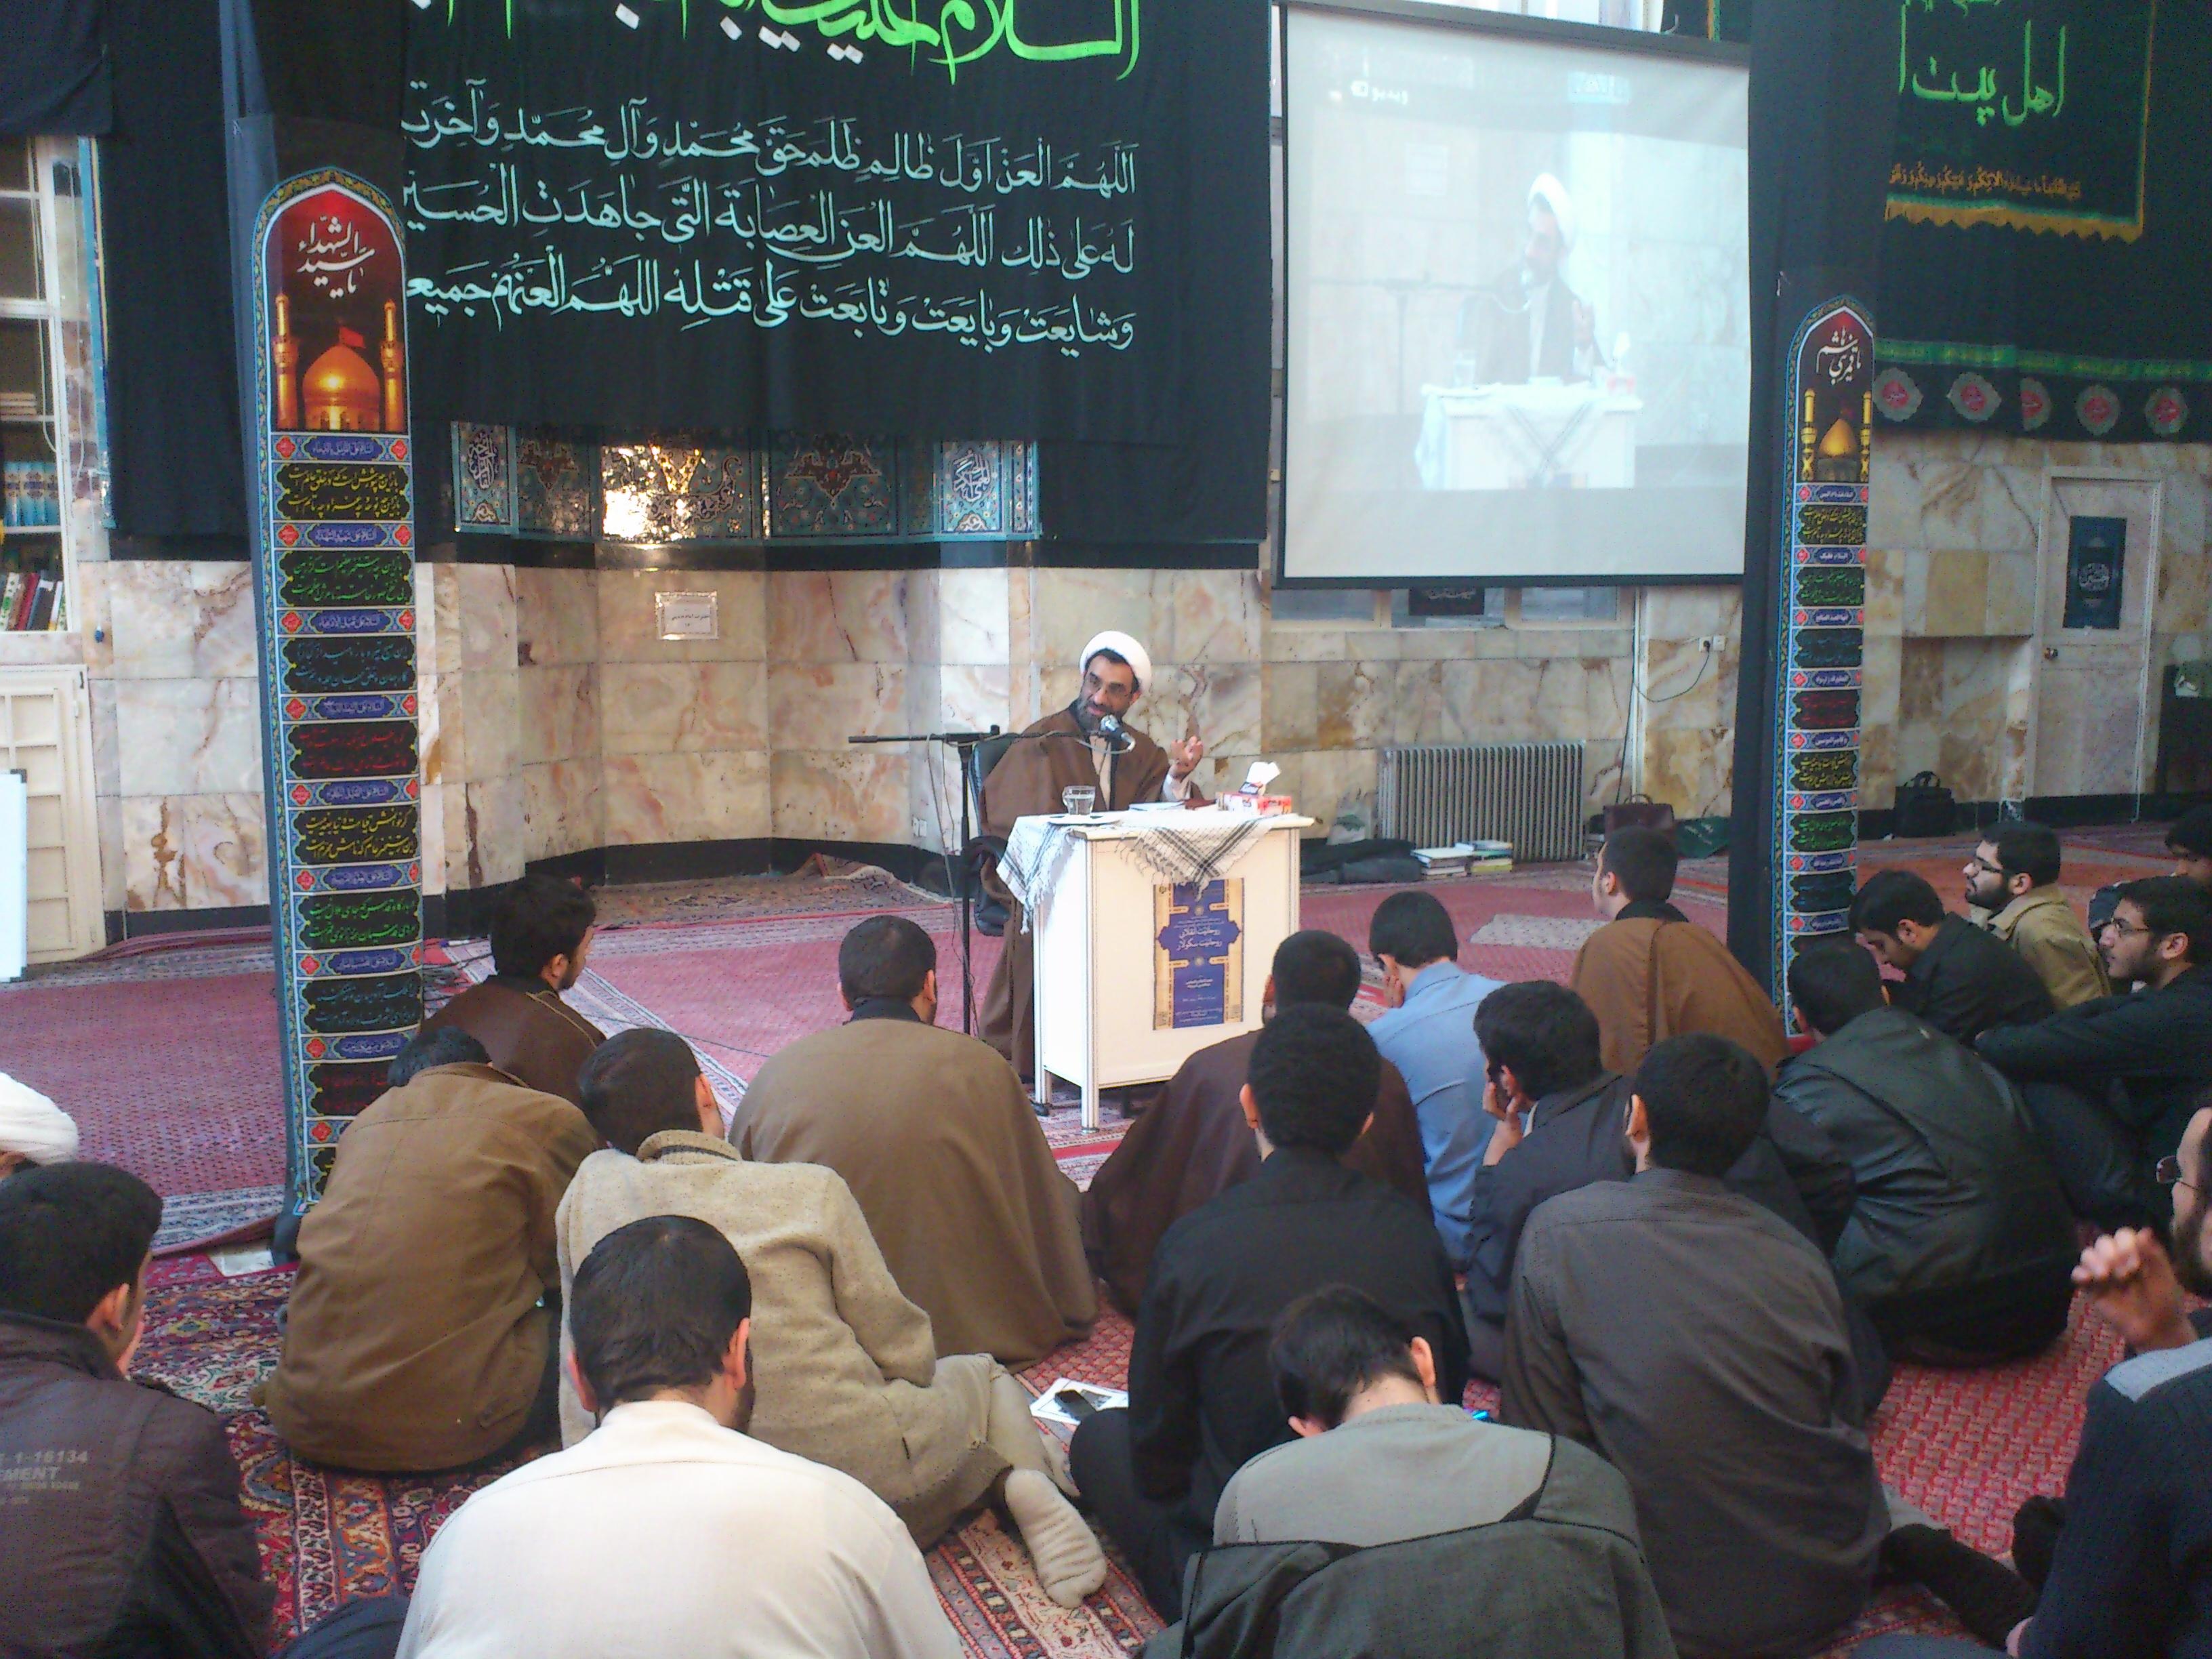 جمعیت طلاب انقلاب اسلامی